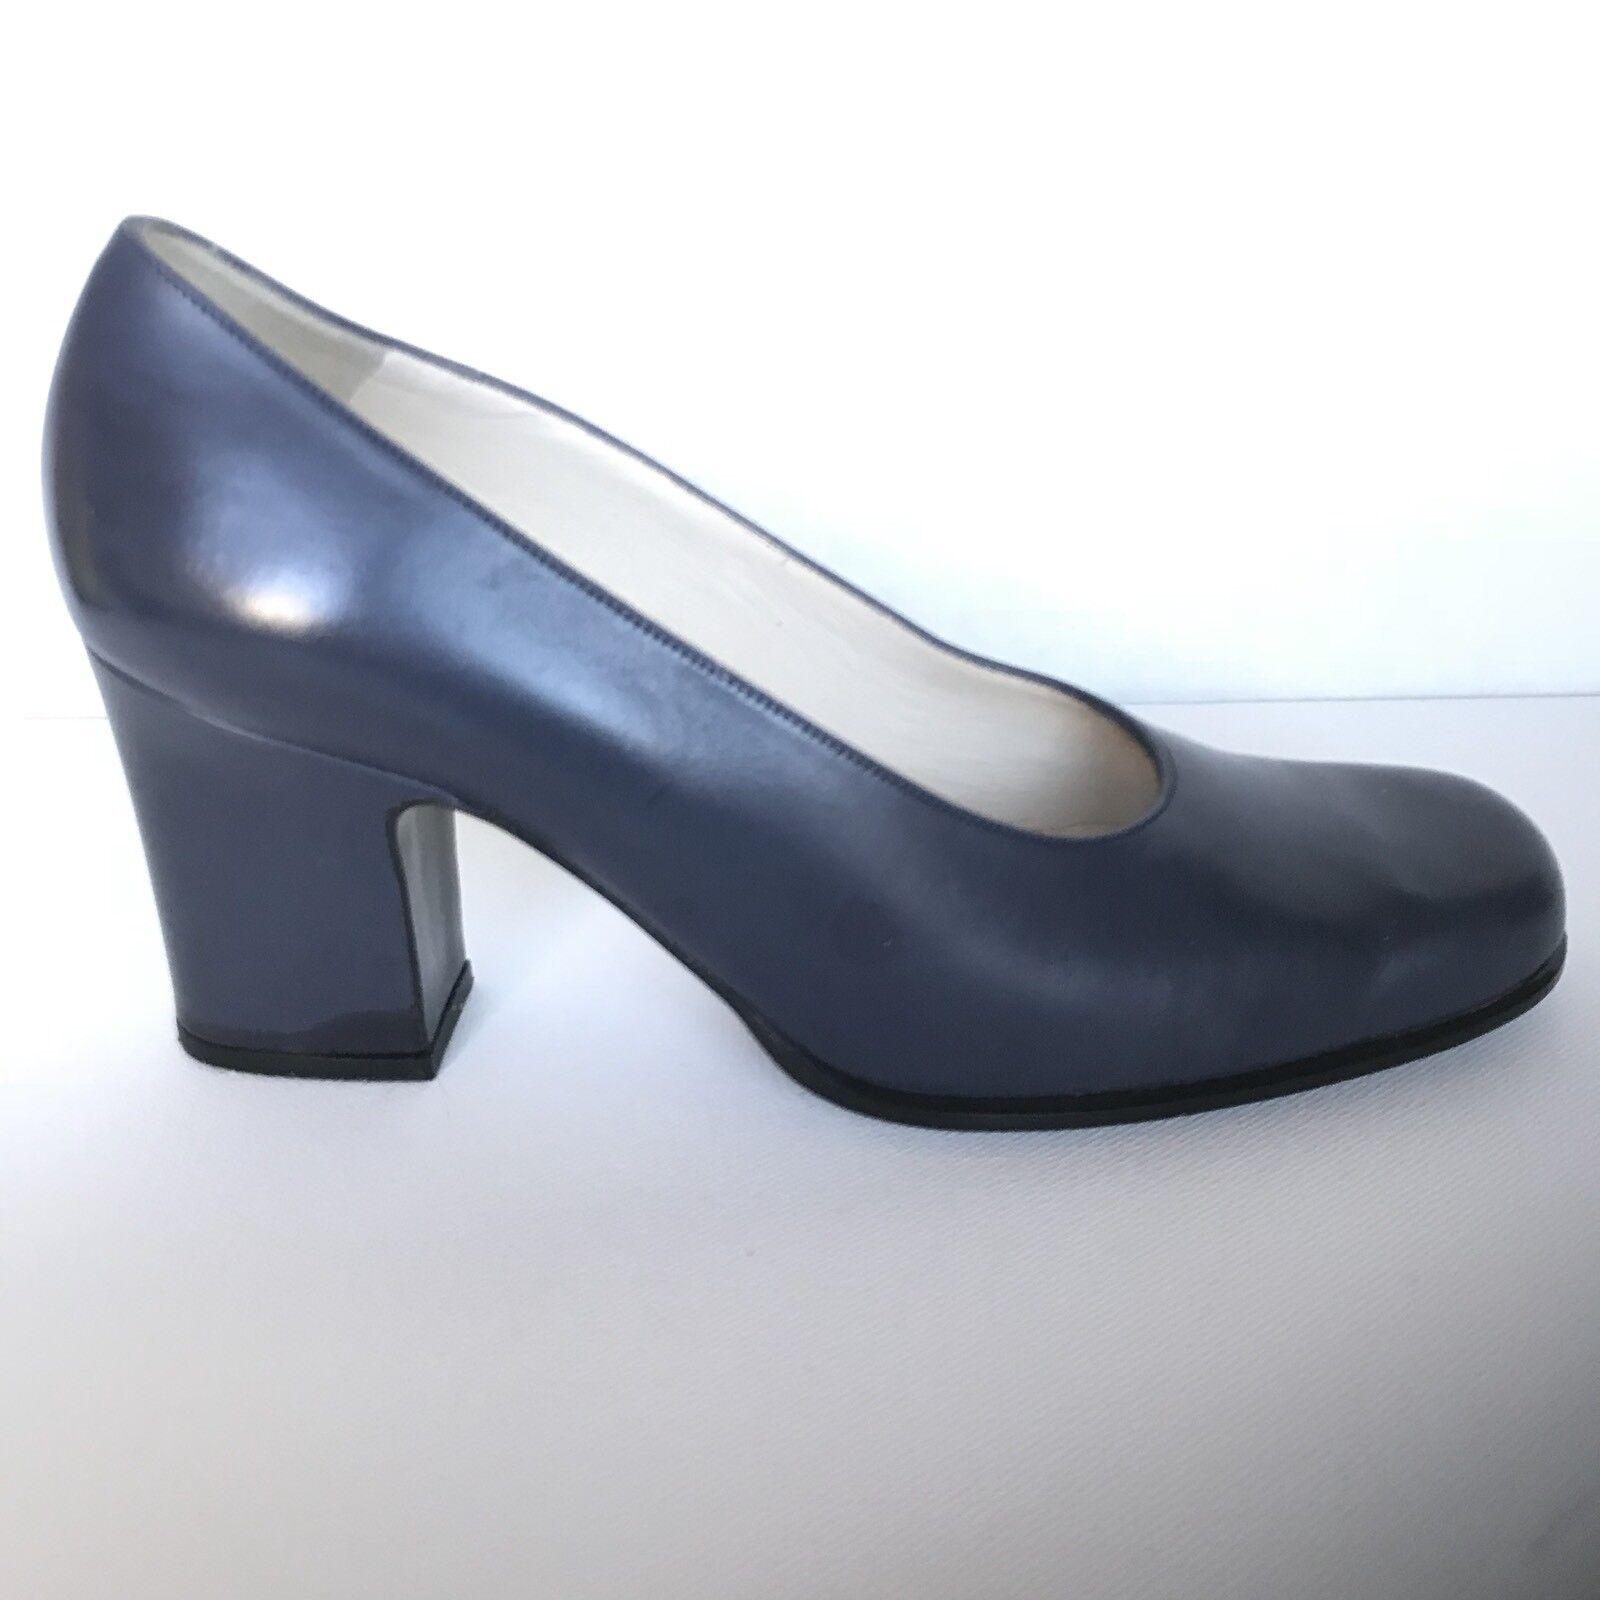 Bally Vintage Navy Pelle Block Heels Round Toe Block Pumps Heels - sz. 7